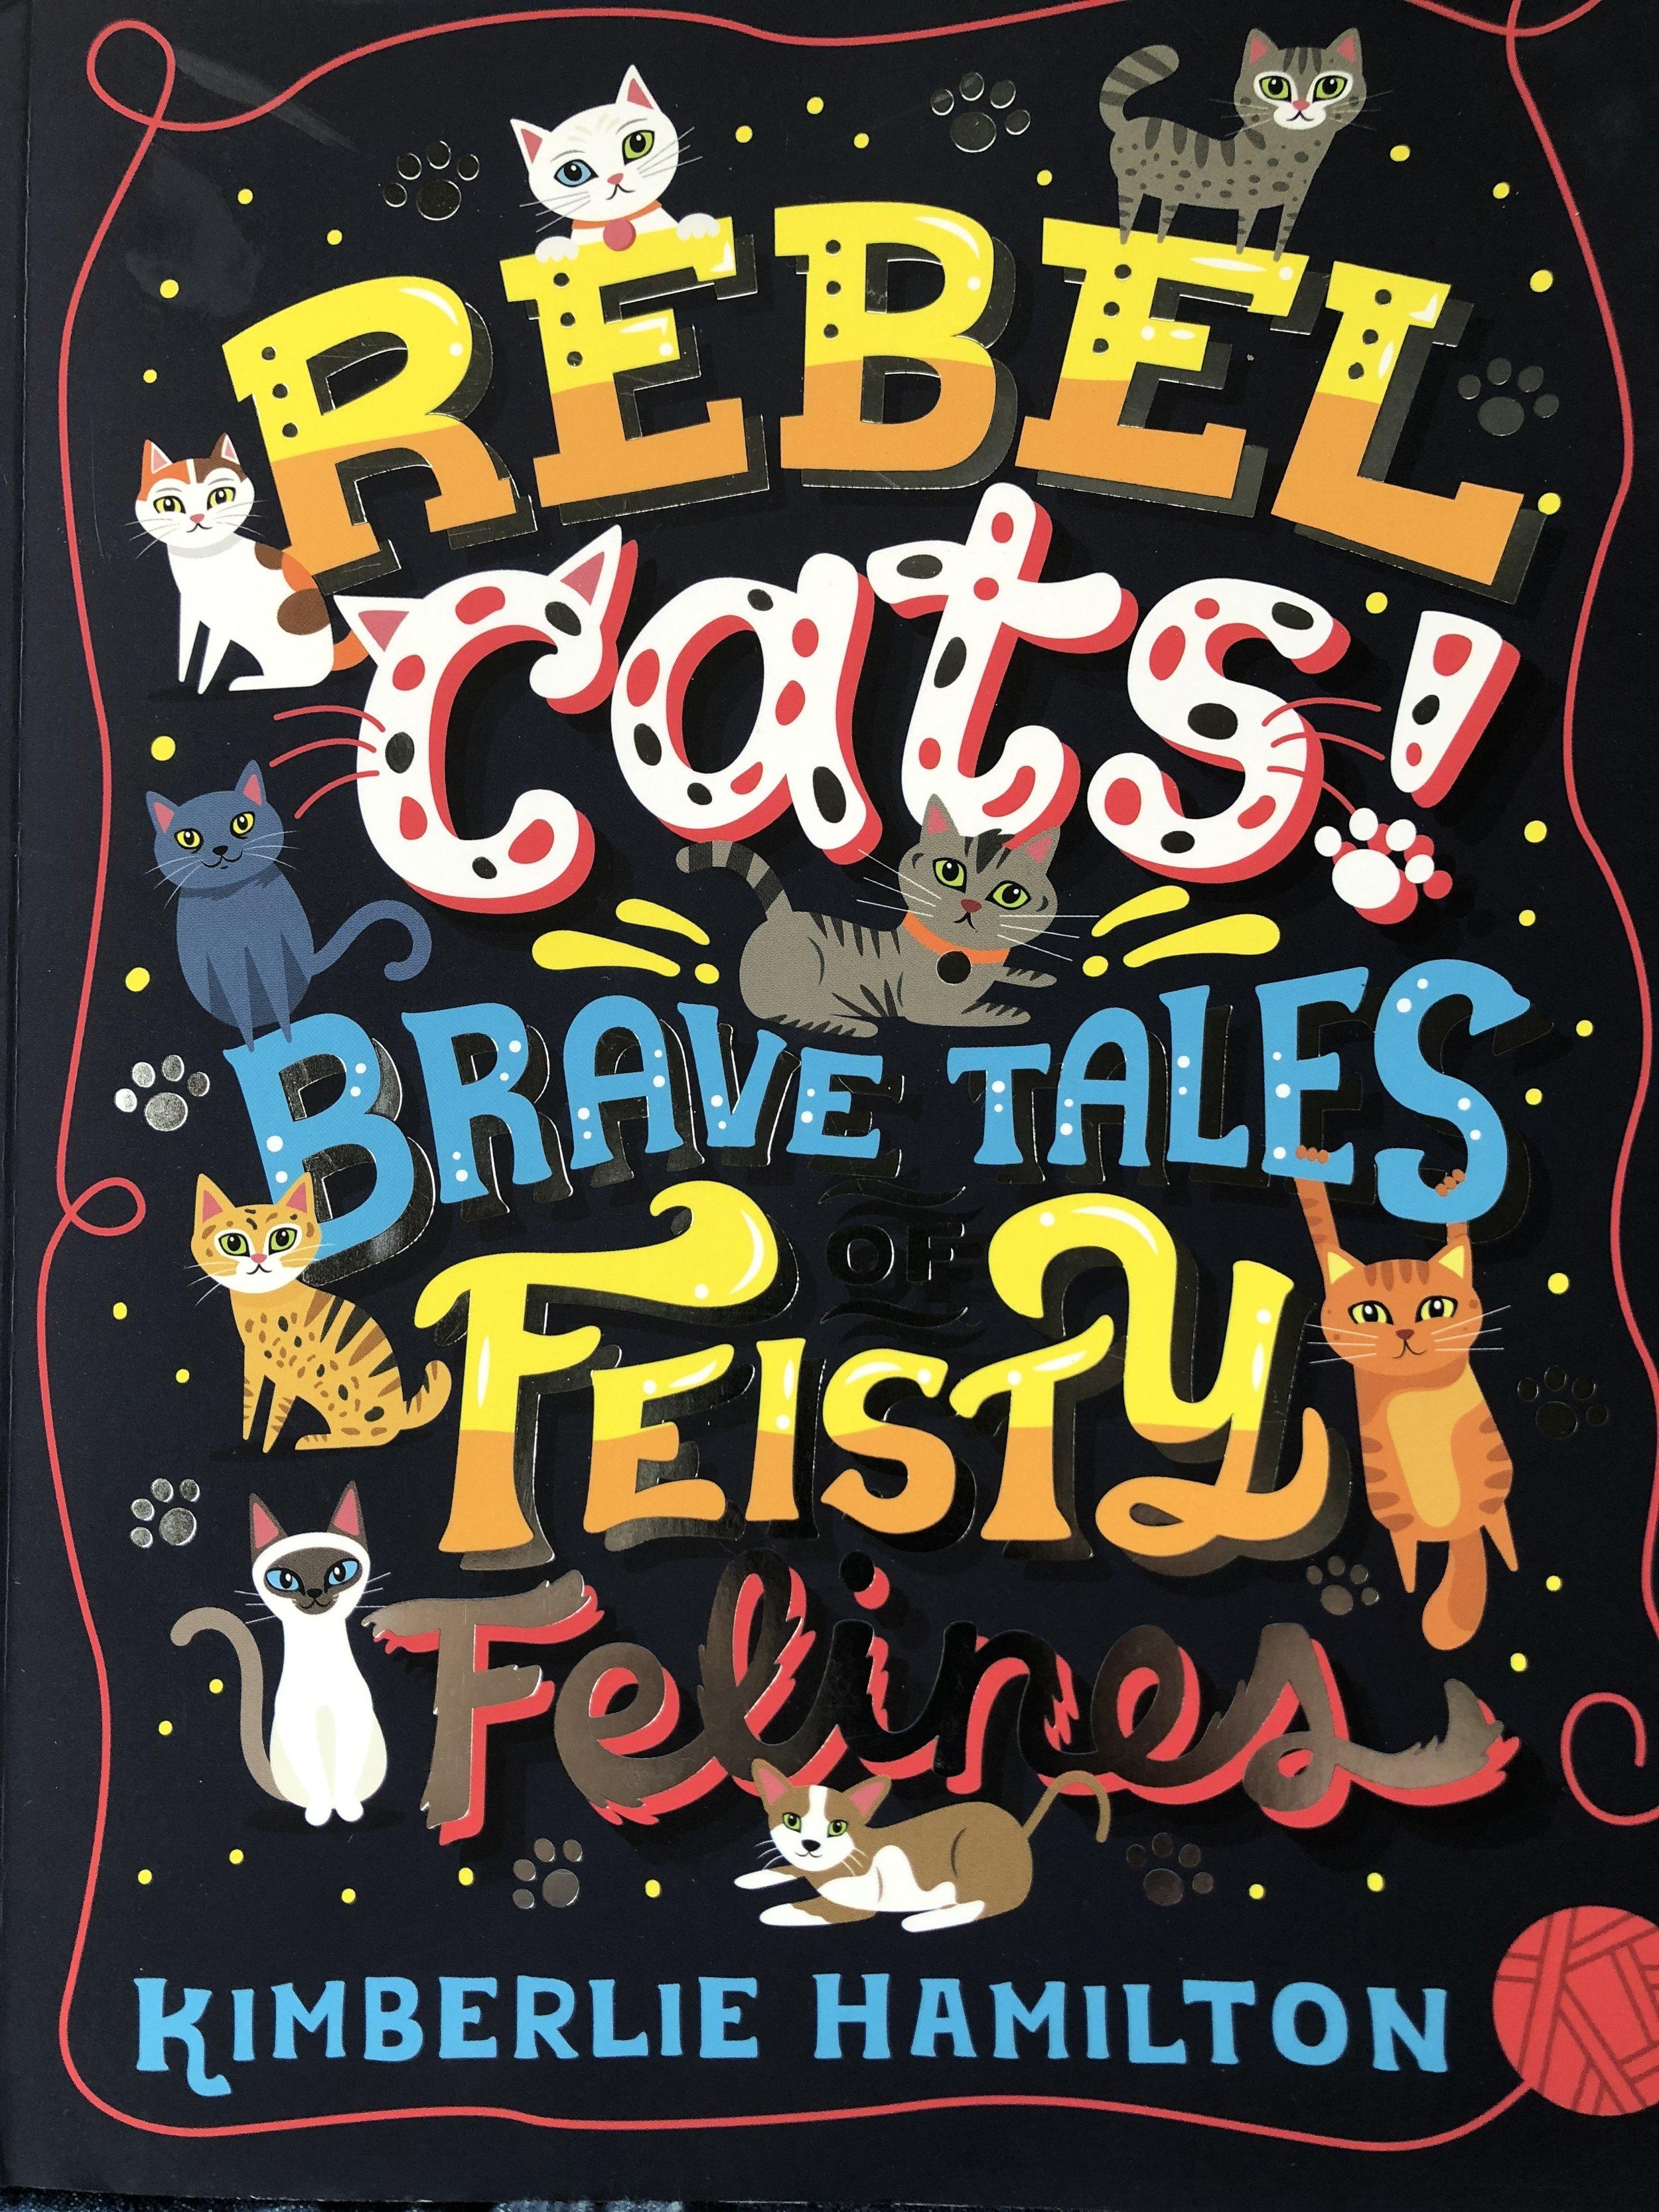 rebel cats.JPG